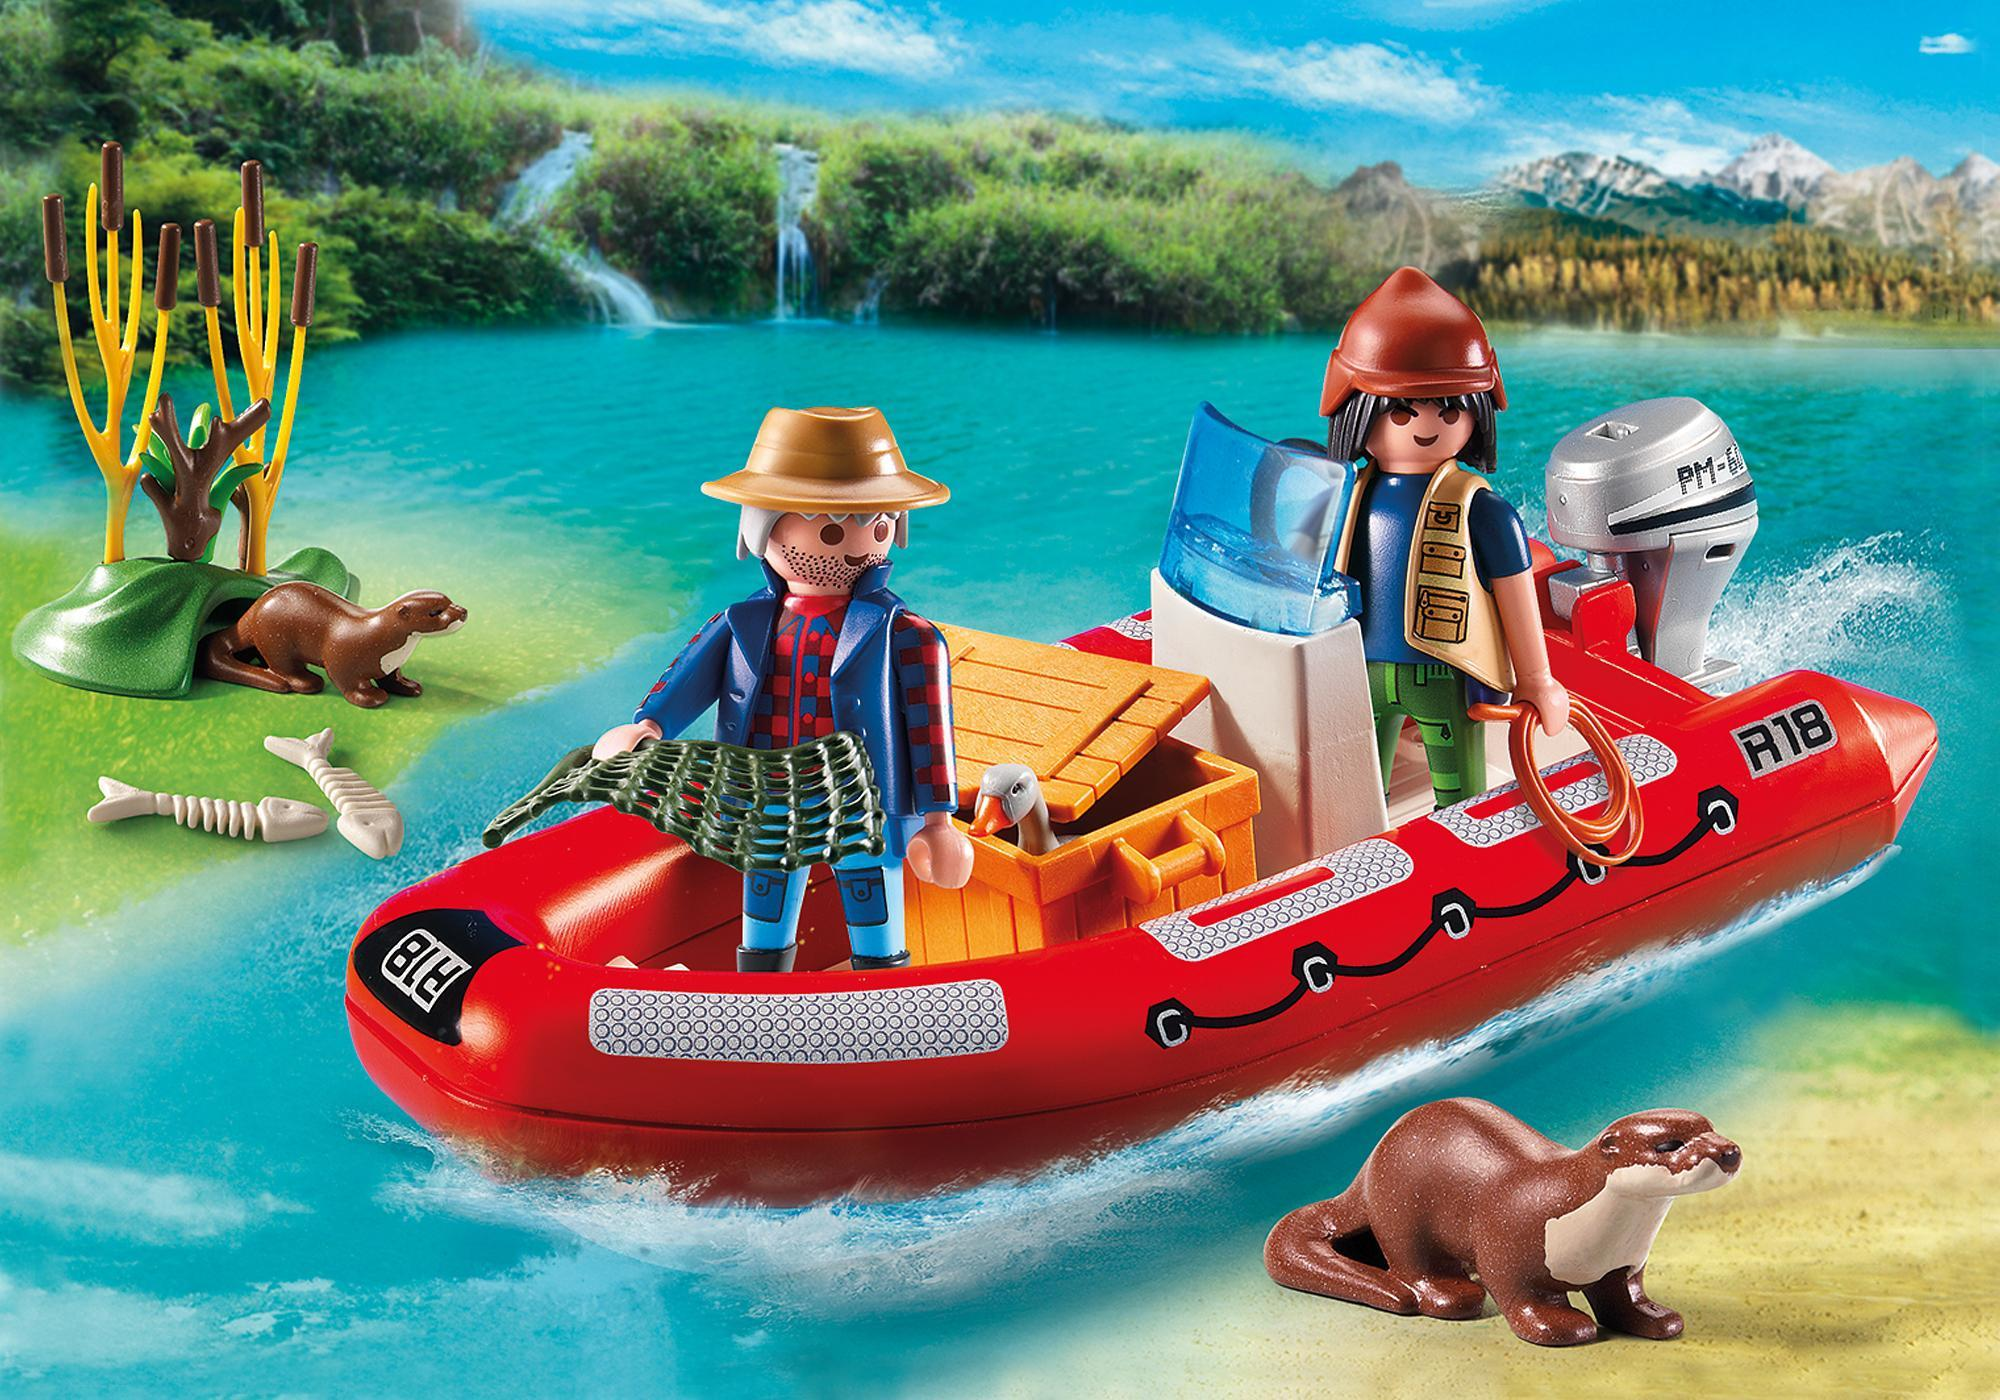 http://media.playmobil.com/i/playmobil/5559_product_detail/Braconniers avec bateau